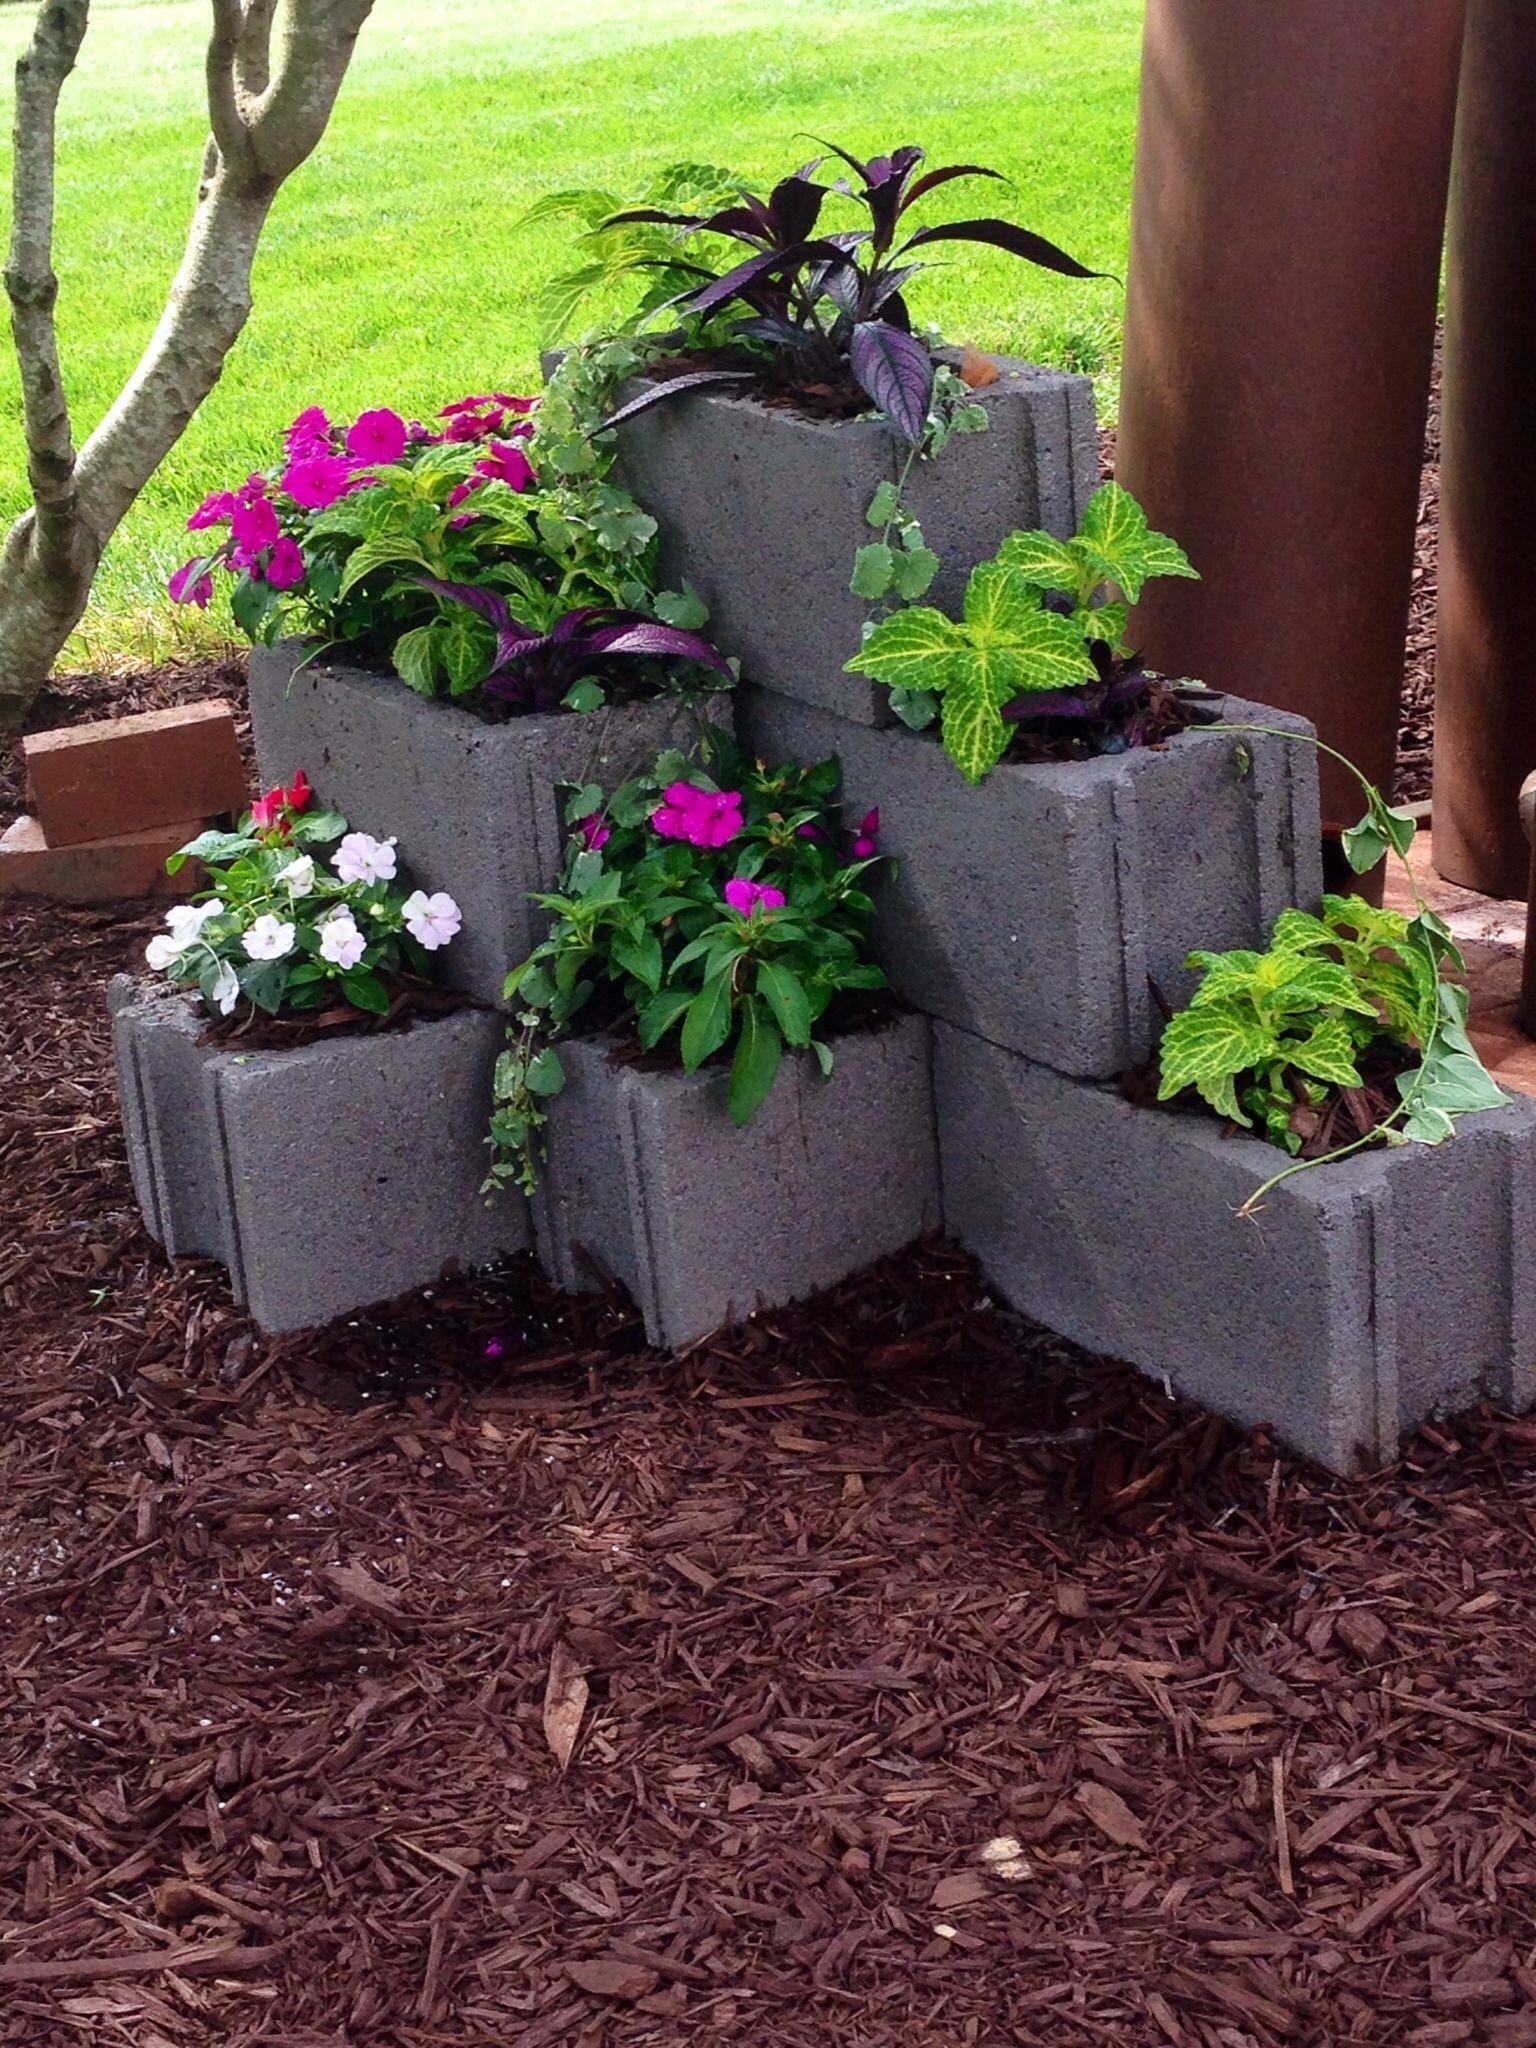 10 Pinterest Garden Ideas Diy Most Of The Brilliant And Attractive In 2020 Cinder Block Garden Garden Projects Garden Planters